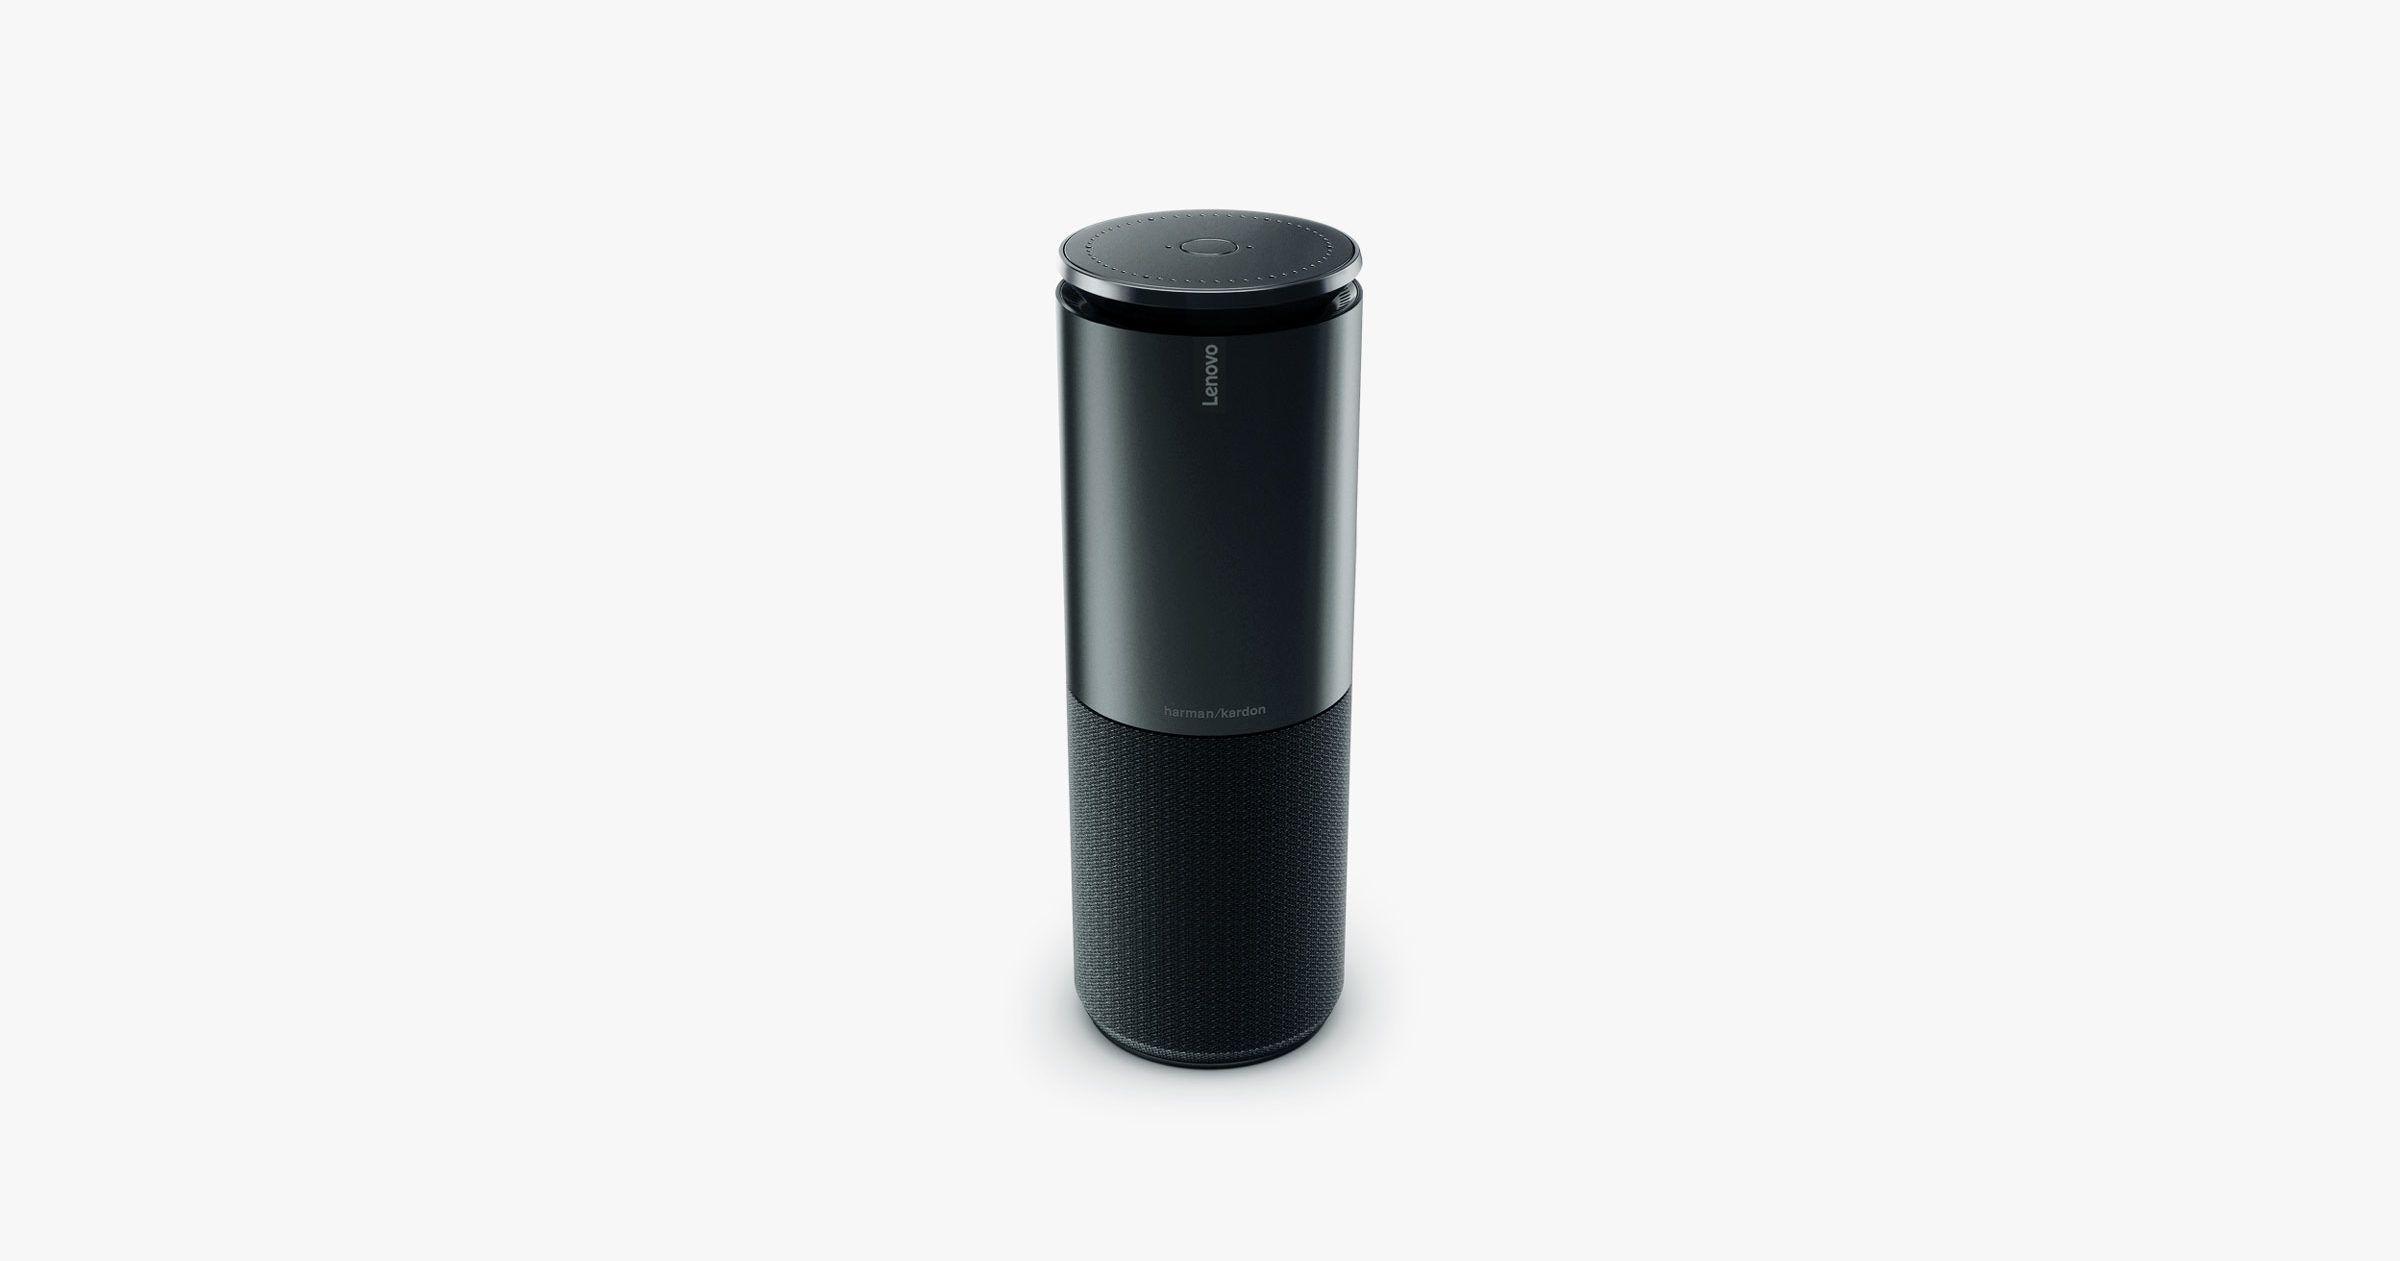 Lenovo S Smart Speaker Marries Up Alexa Smarts And Harman Kardon Sounds Wired Harman Kardon Smart Speaker Alexa